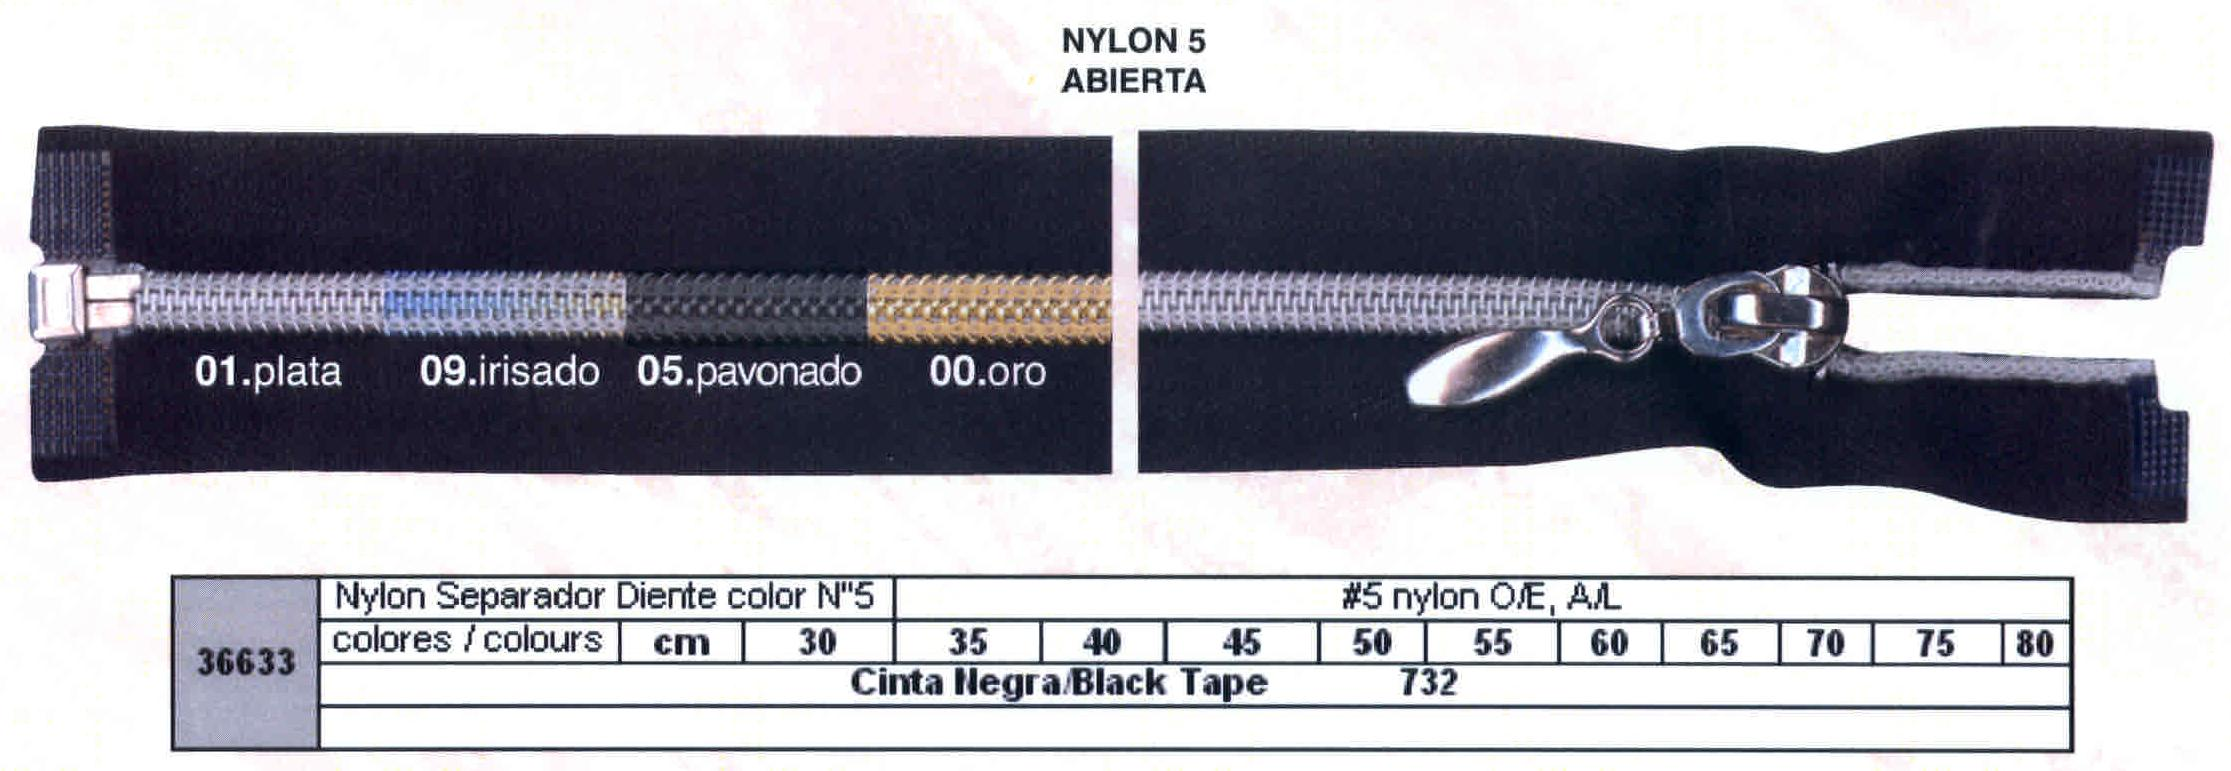 Cremallera SNS Nylon M-5 Separador Metal